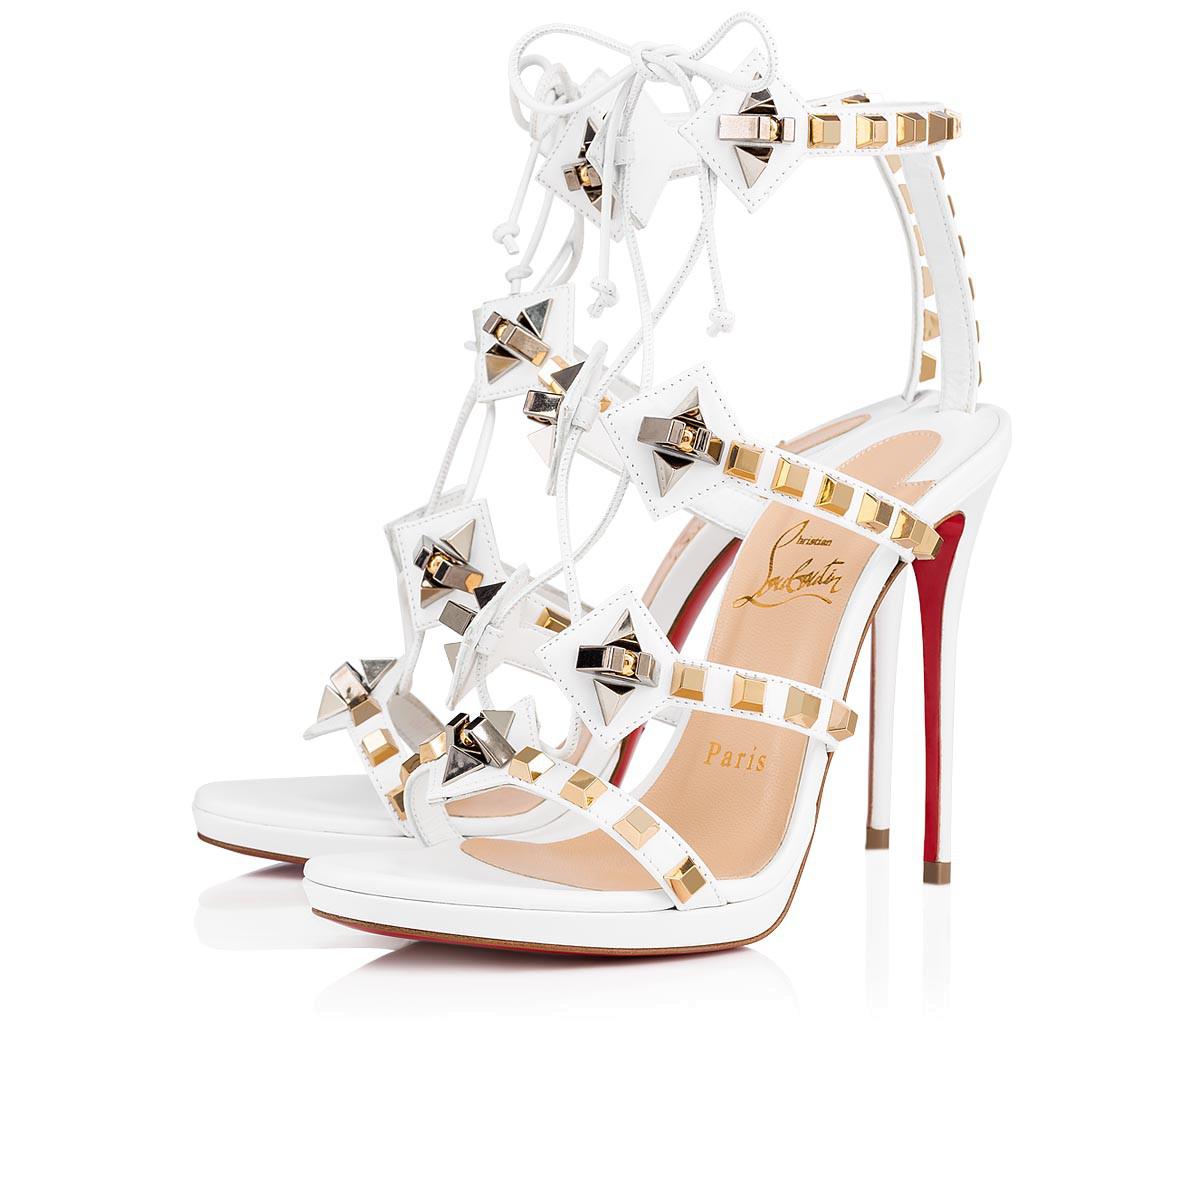 48931be06ea Christian Louboutin Multiplaticool Studded Gladiator Sandal In Version Snow